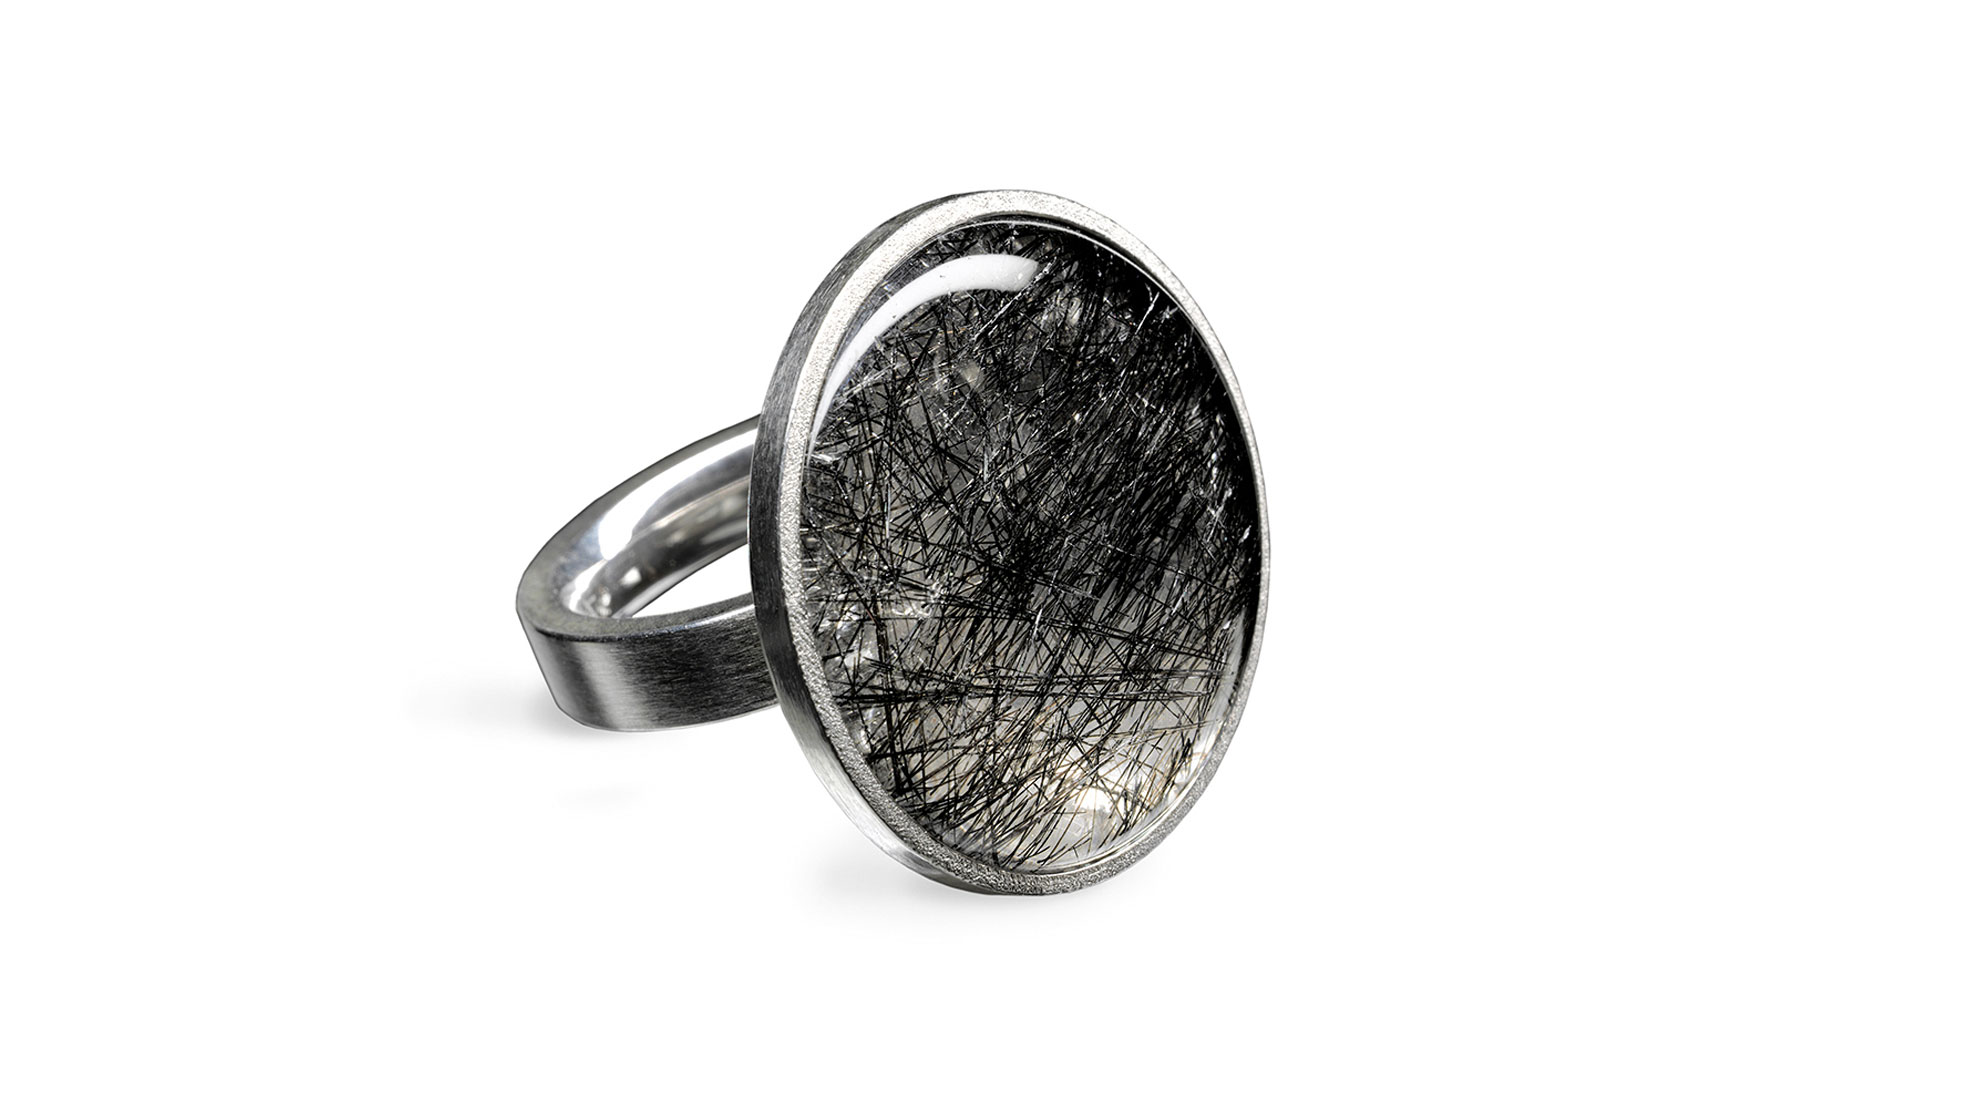 03 Ring Rutilquarz 925 Silber, Bergkristall mit schwarzen Rutilnadeln